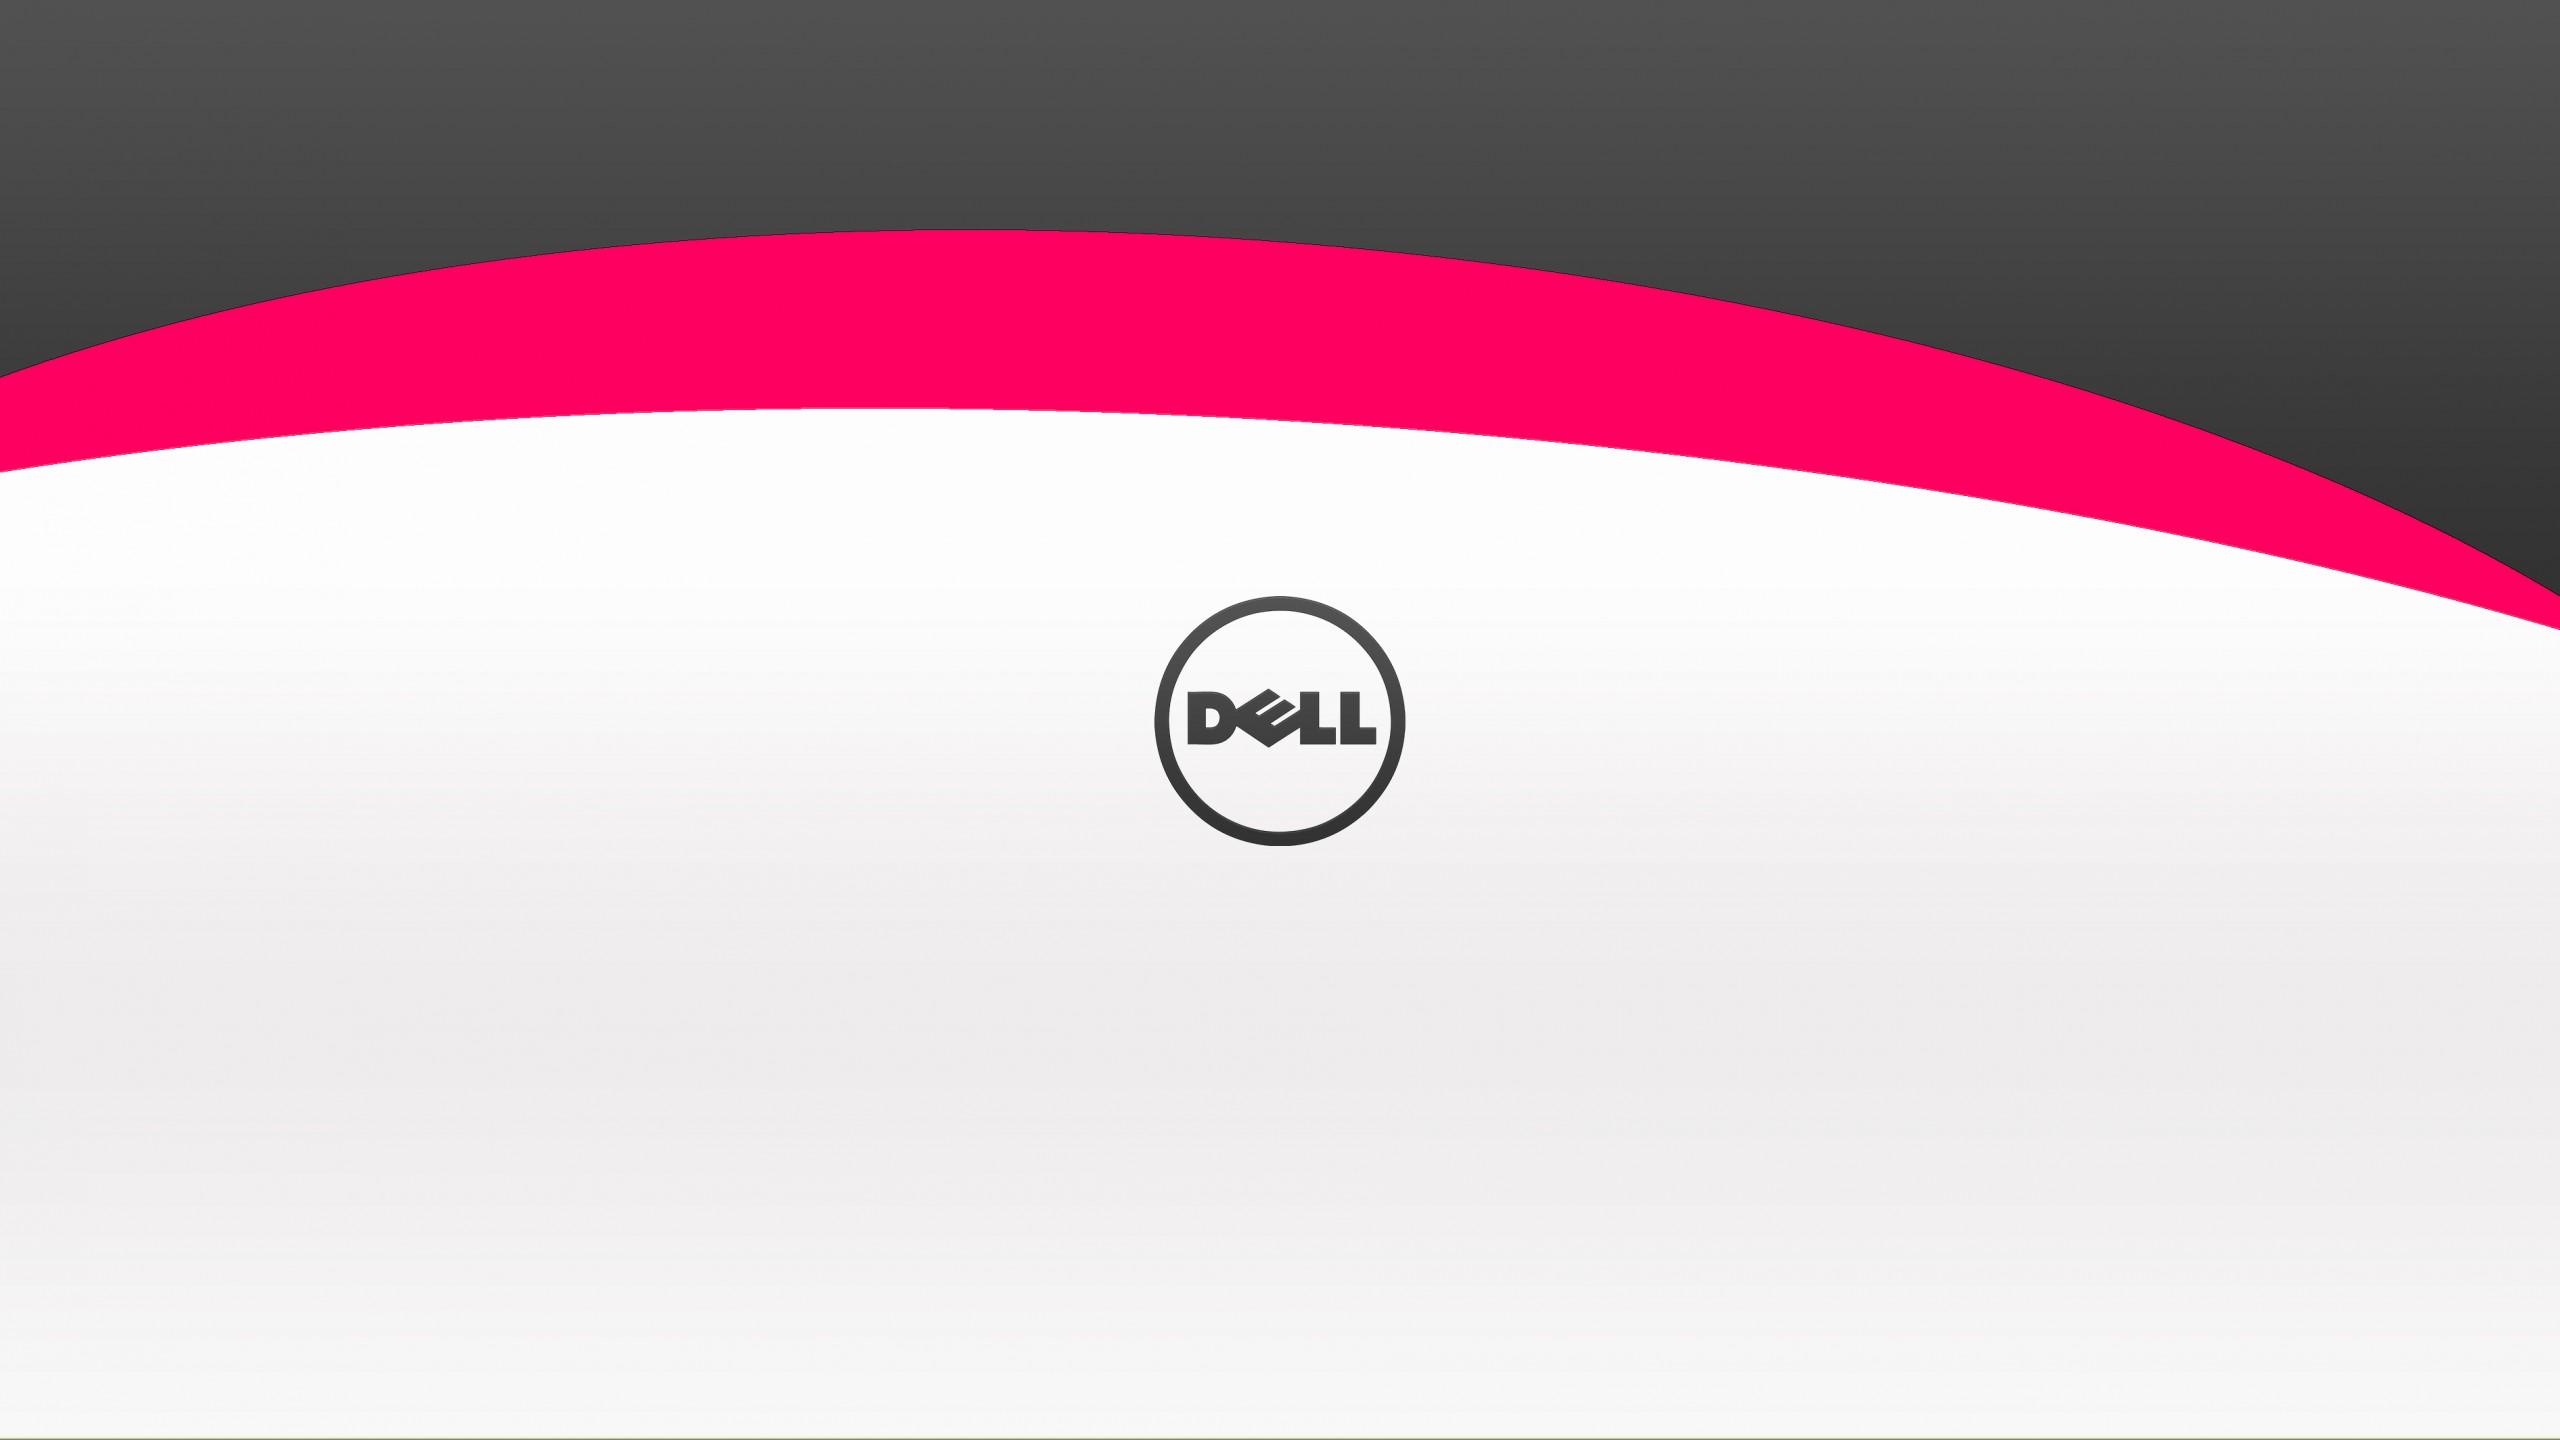 Pc Dell Wallpaper 4k - 2560x1440 ...